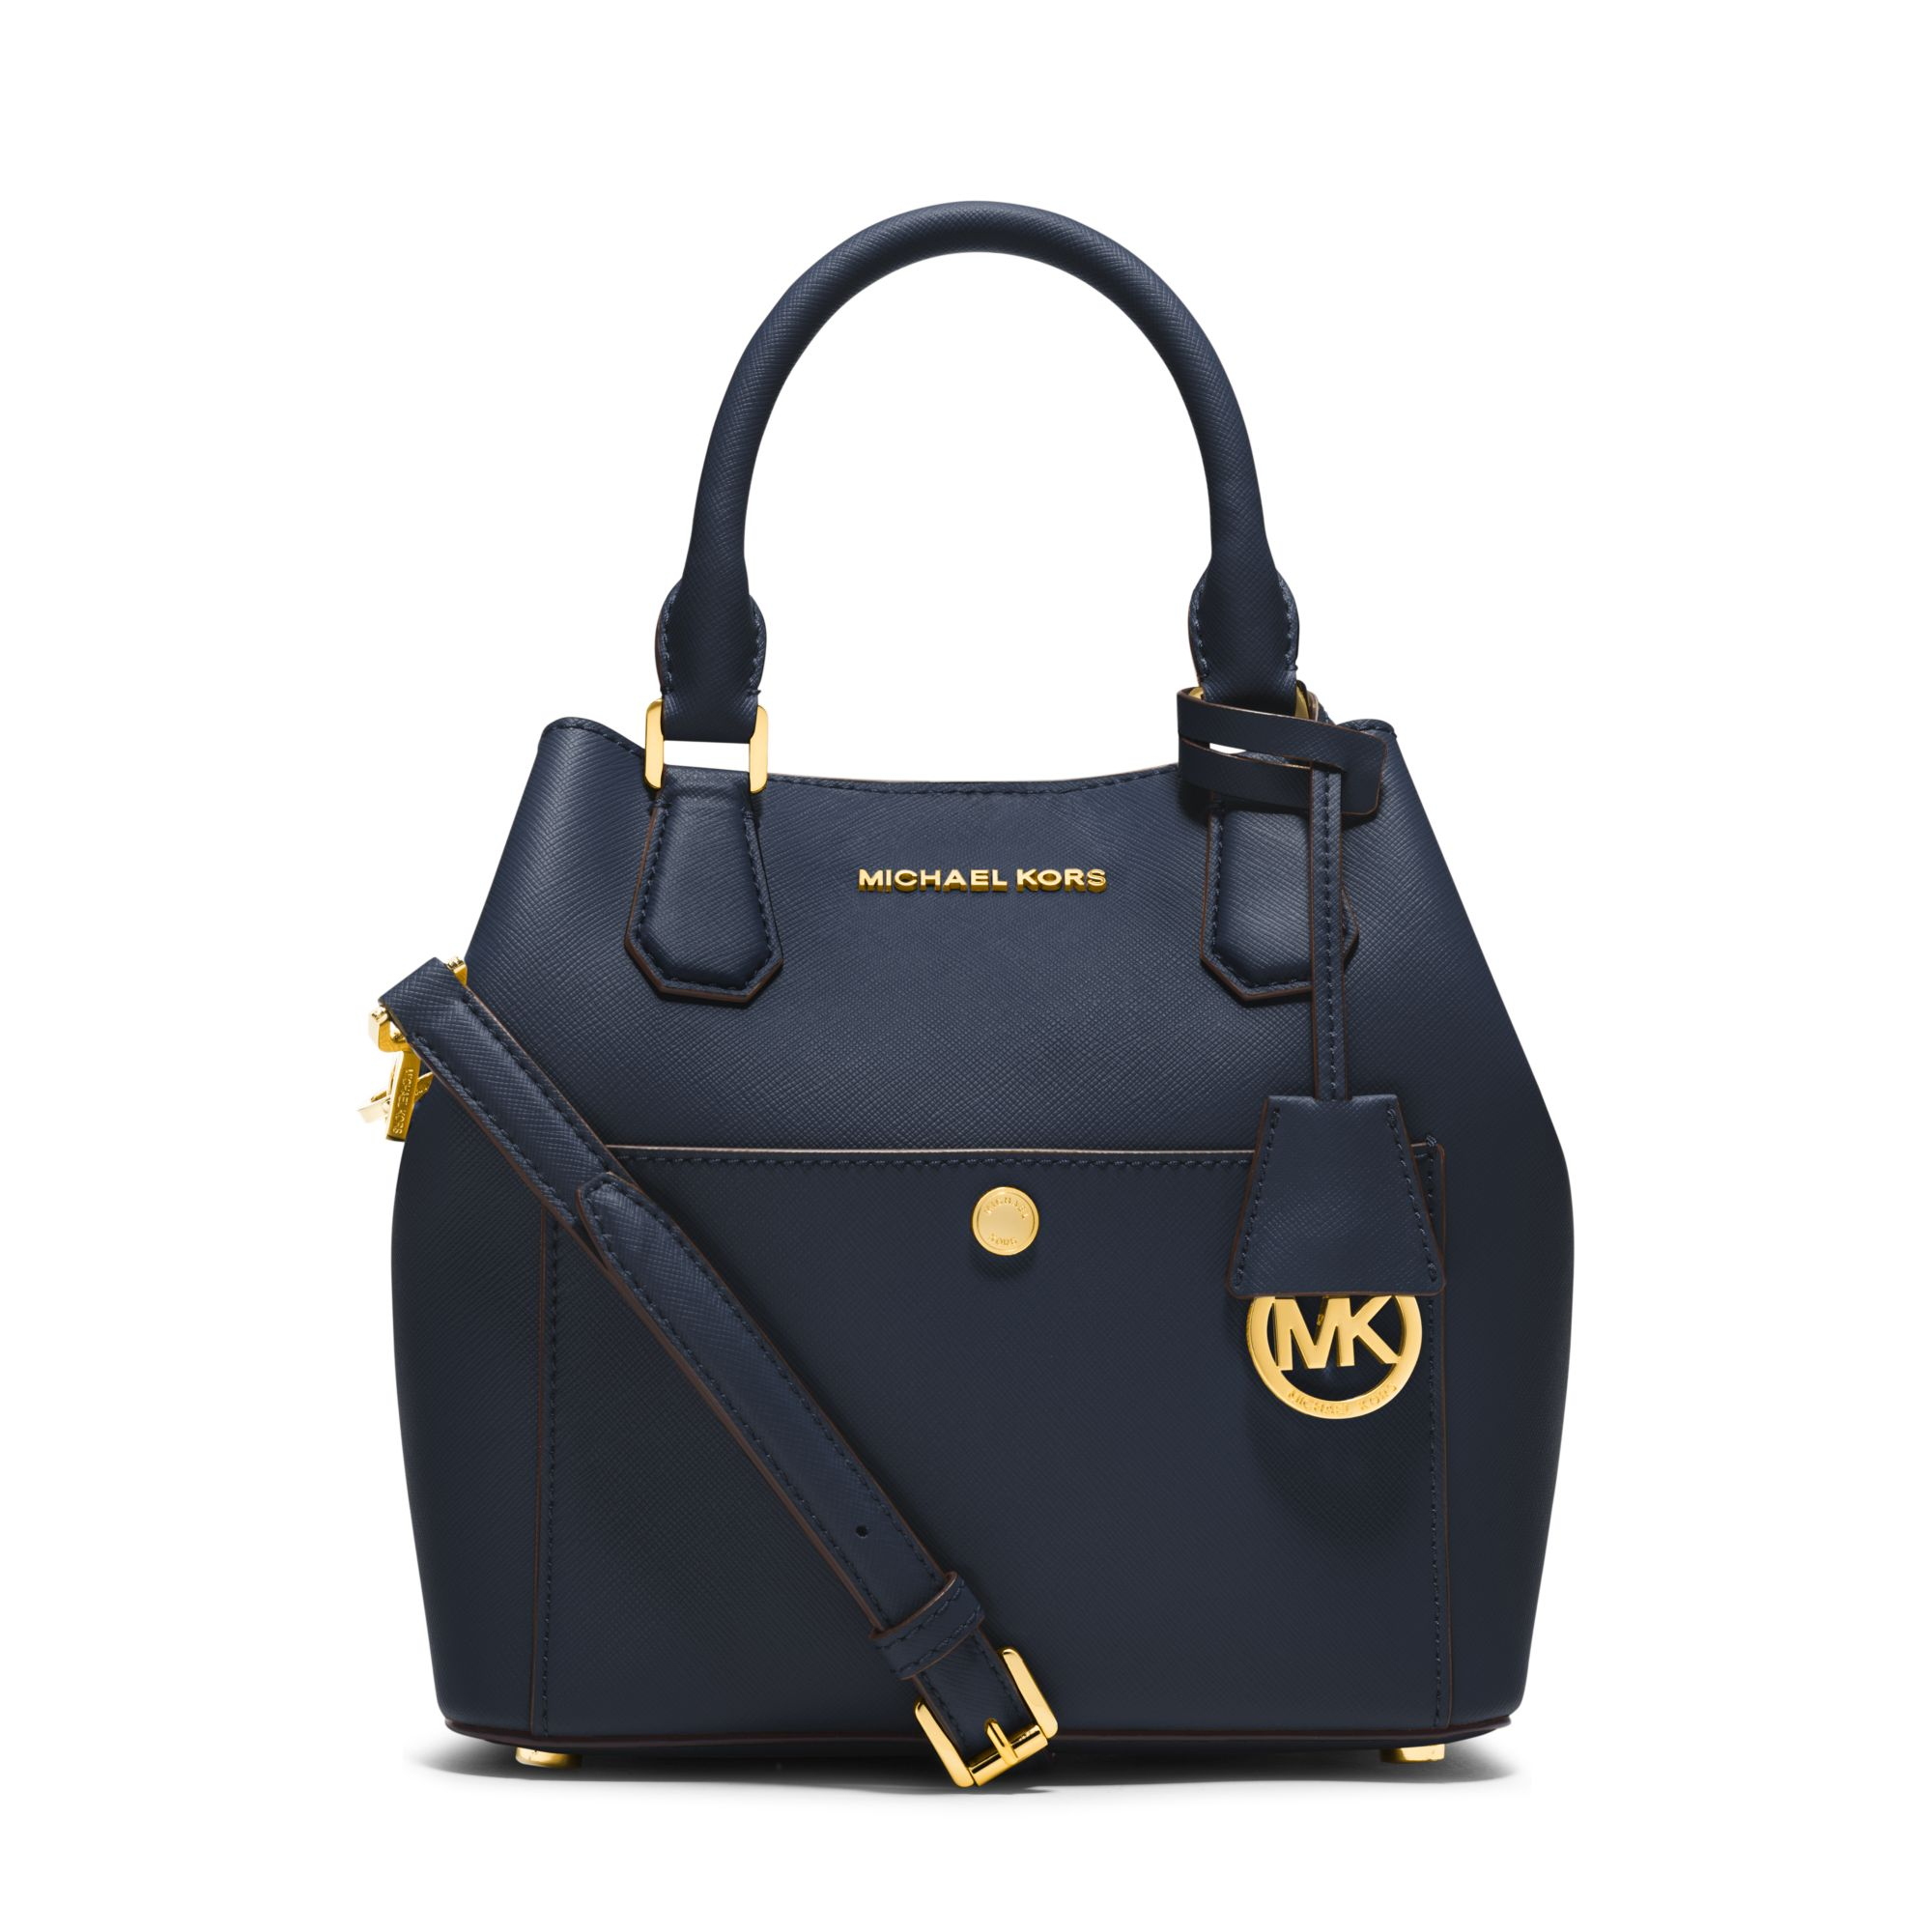 692e9534fe58 ... czech lyst michael kors greenwich medium saffiano leather satchel in  blue d91b1 c9e91